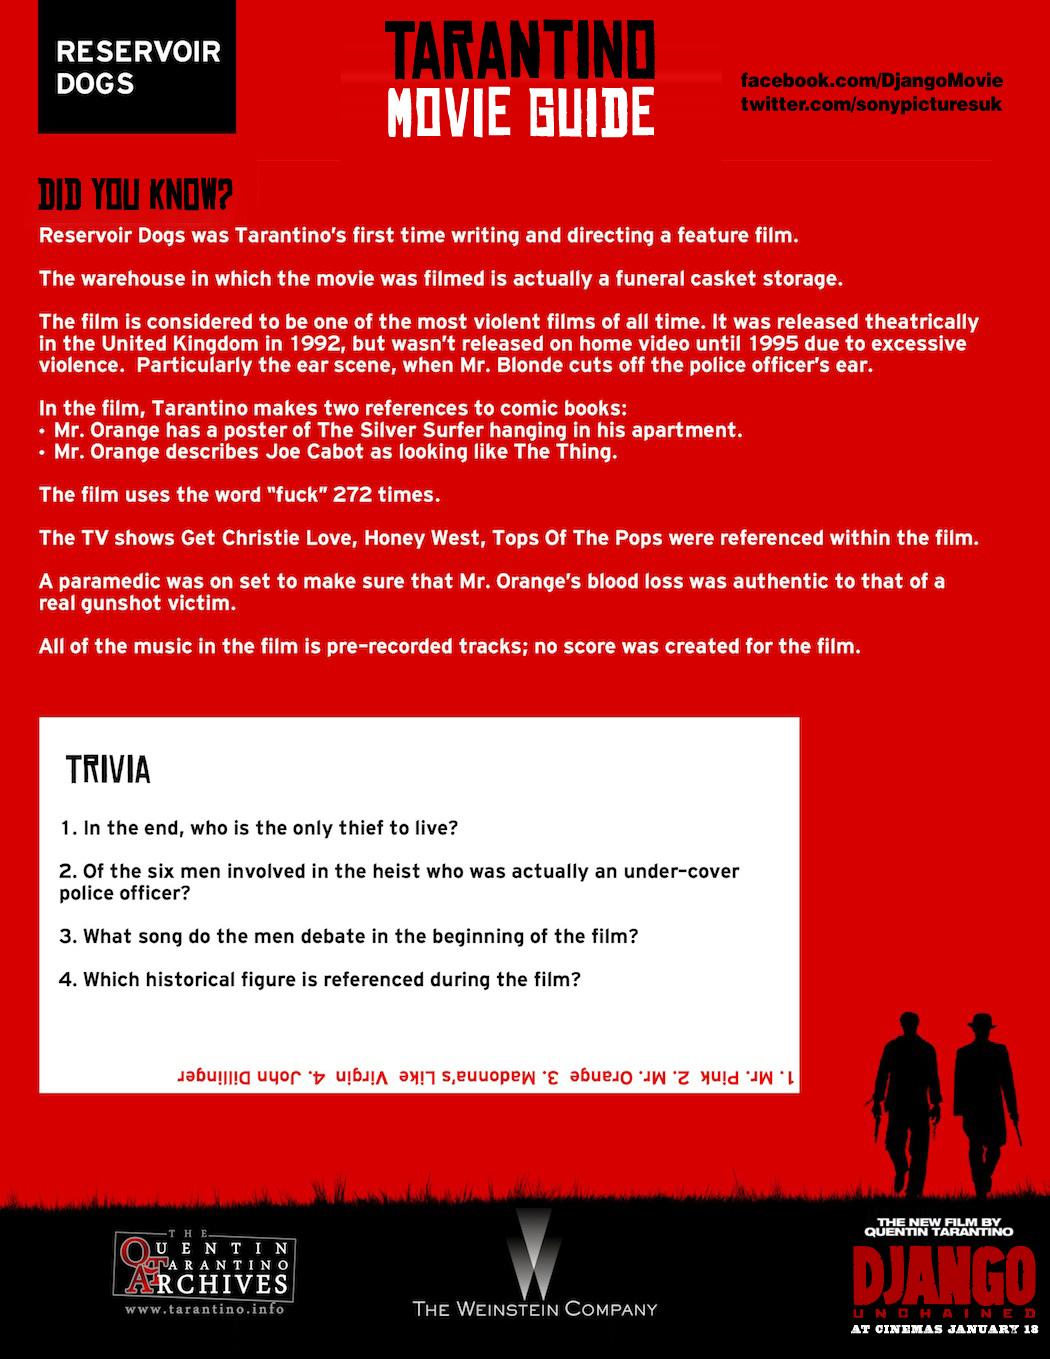 Tarantino Movie Guide - Reservoir Dogs